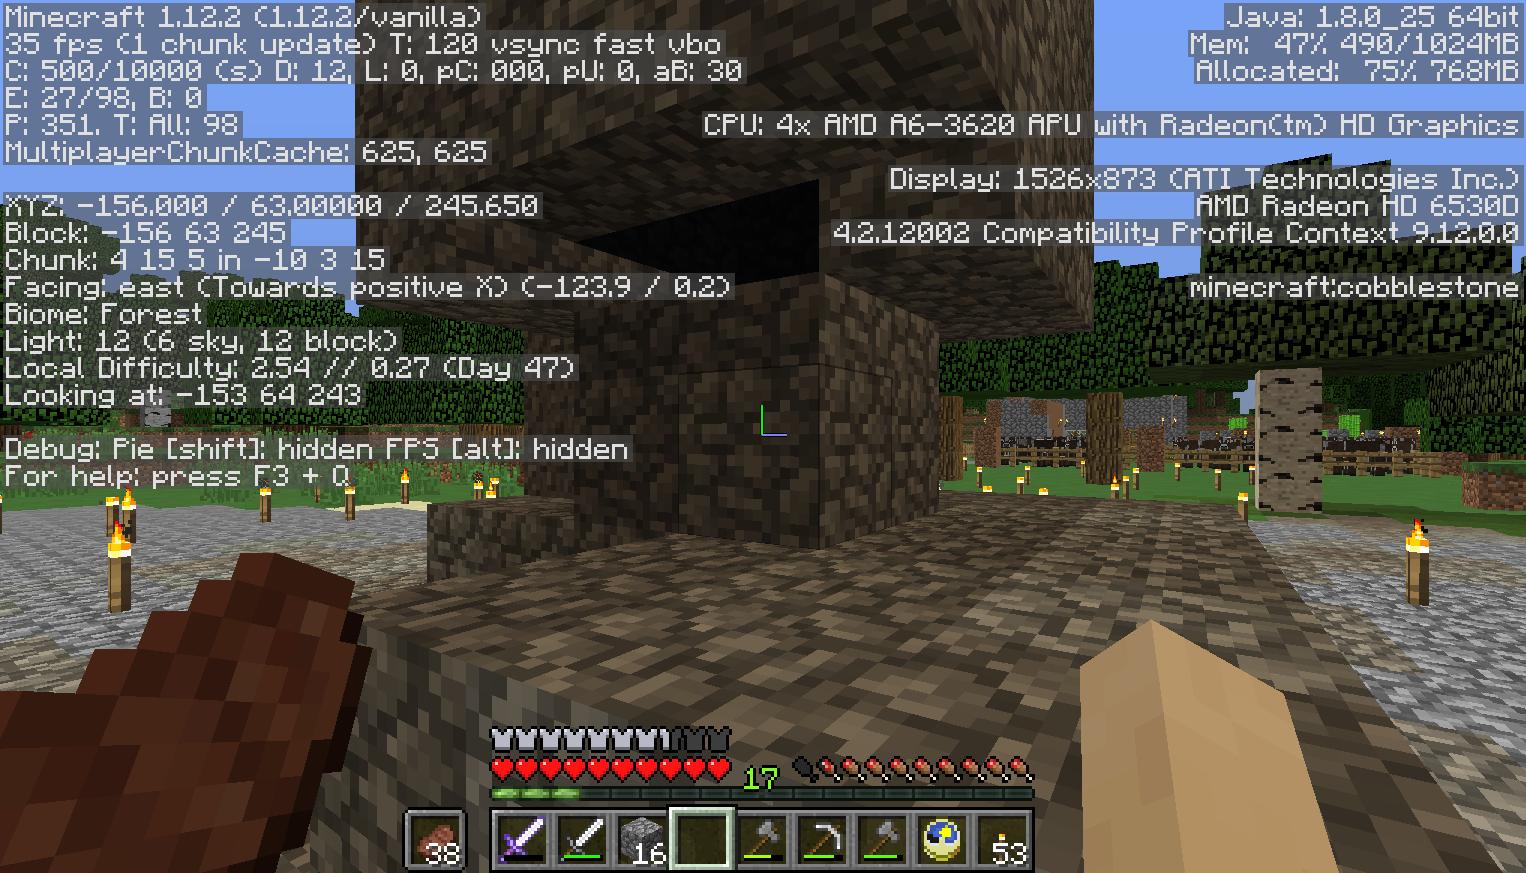 XP farm not working? - Survival Mode - Minecraft: Java Edition